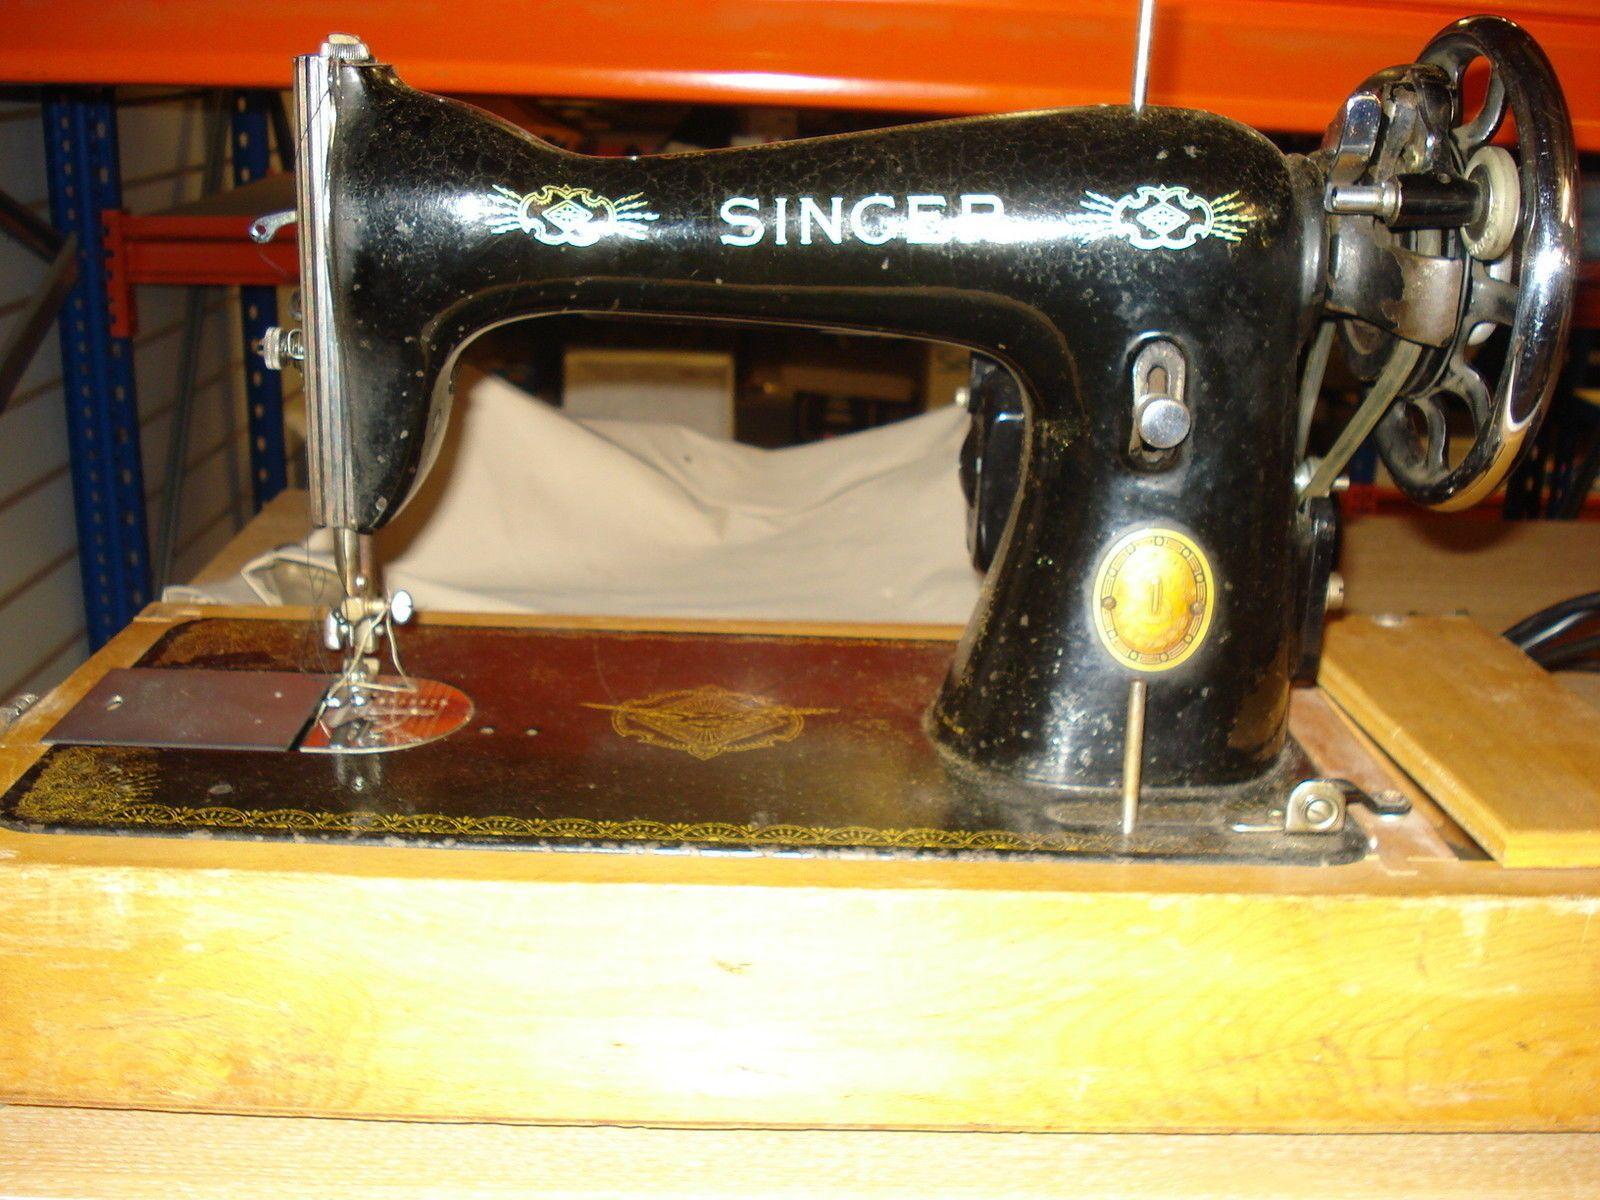 Vintage 1930's SINGER 15K / 15-91 ELECTRIC SEWING MACHINE - Needs Attention | eBay